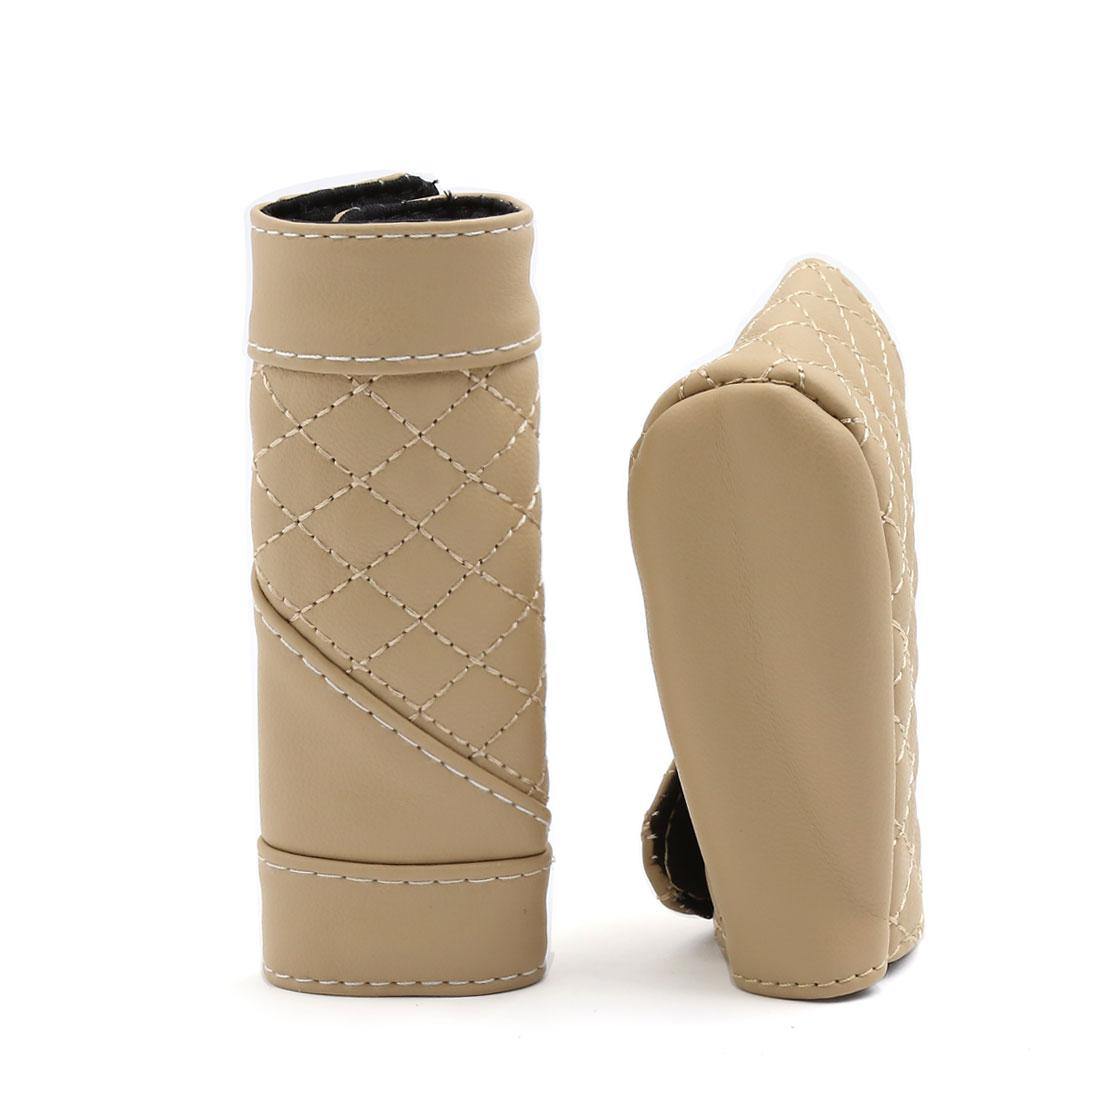 2 in 1 Beige Hook Loop Closure Manual Shift Knob Handbrake Cover Sleeve for Car